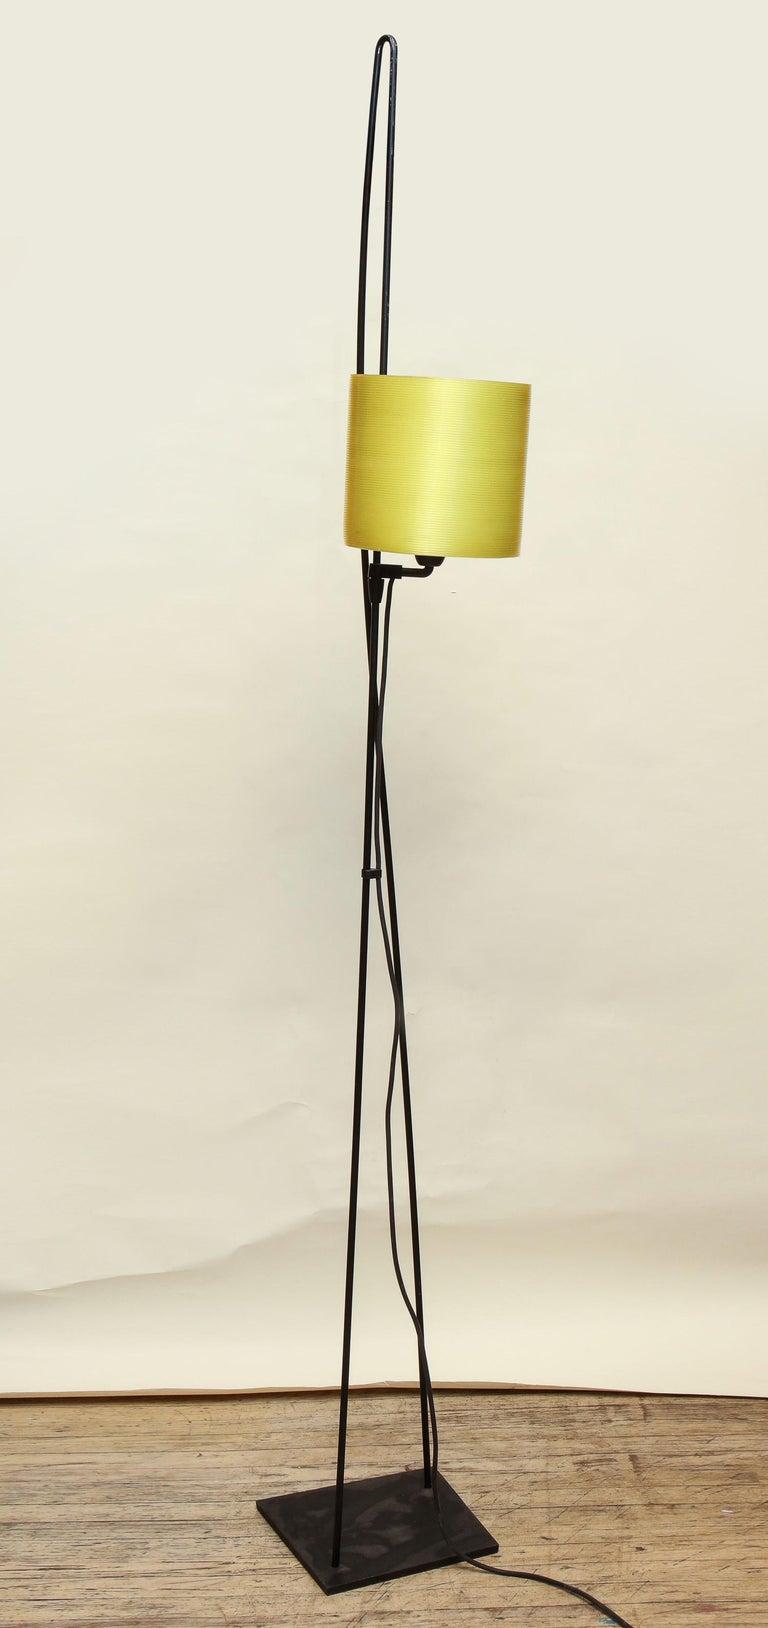 Italiana Luce Floor Lamp Mid-Century Modern Ion and Plexiglass, Italy, 1970 For Sale 2